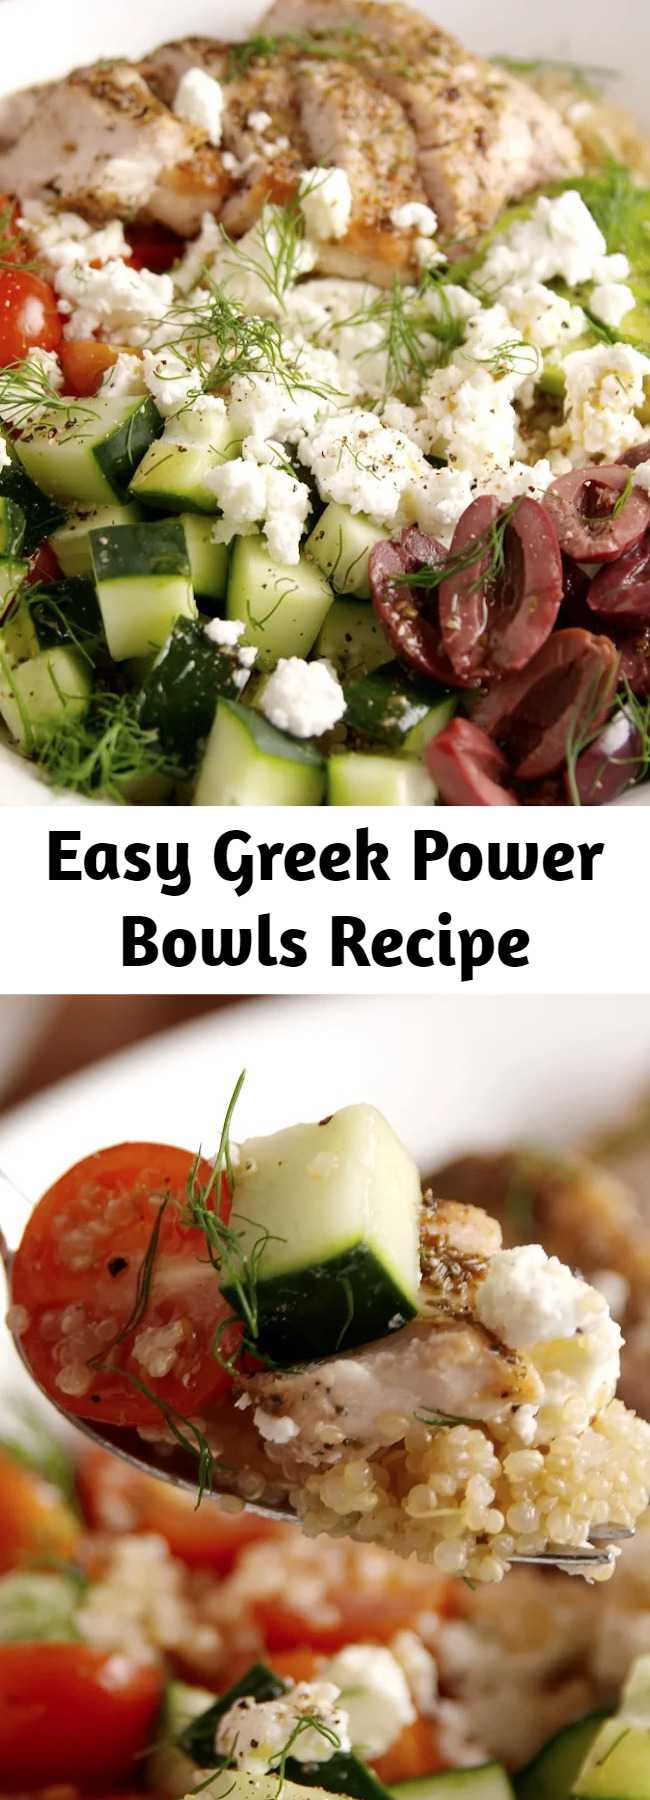 Easy Greek Power Bowls Recipe - Get us to the Greek [bowl]!